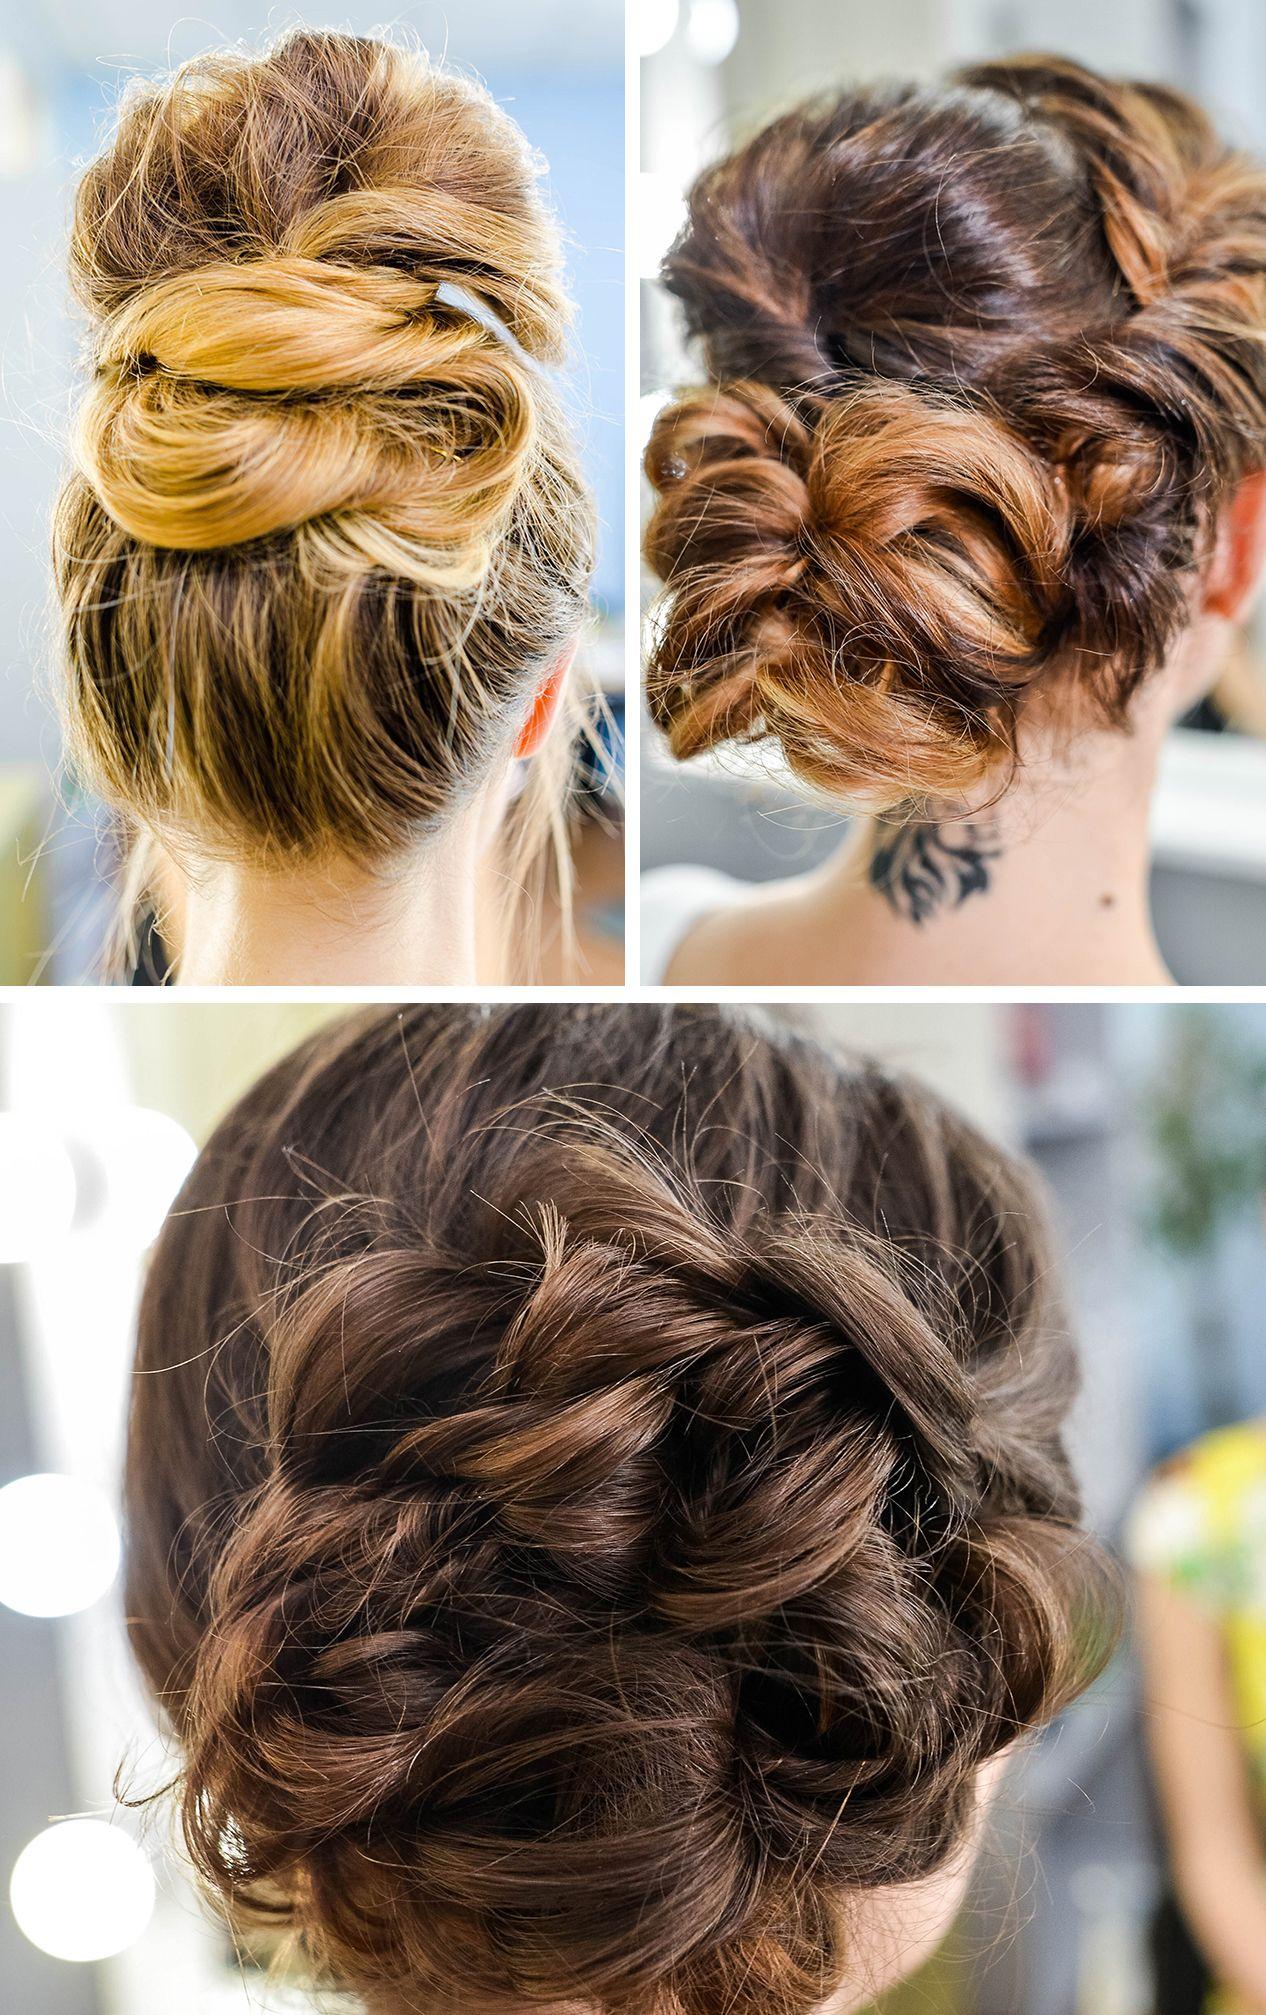 3 Lovely Bun Hairstyles for Fine Hair